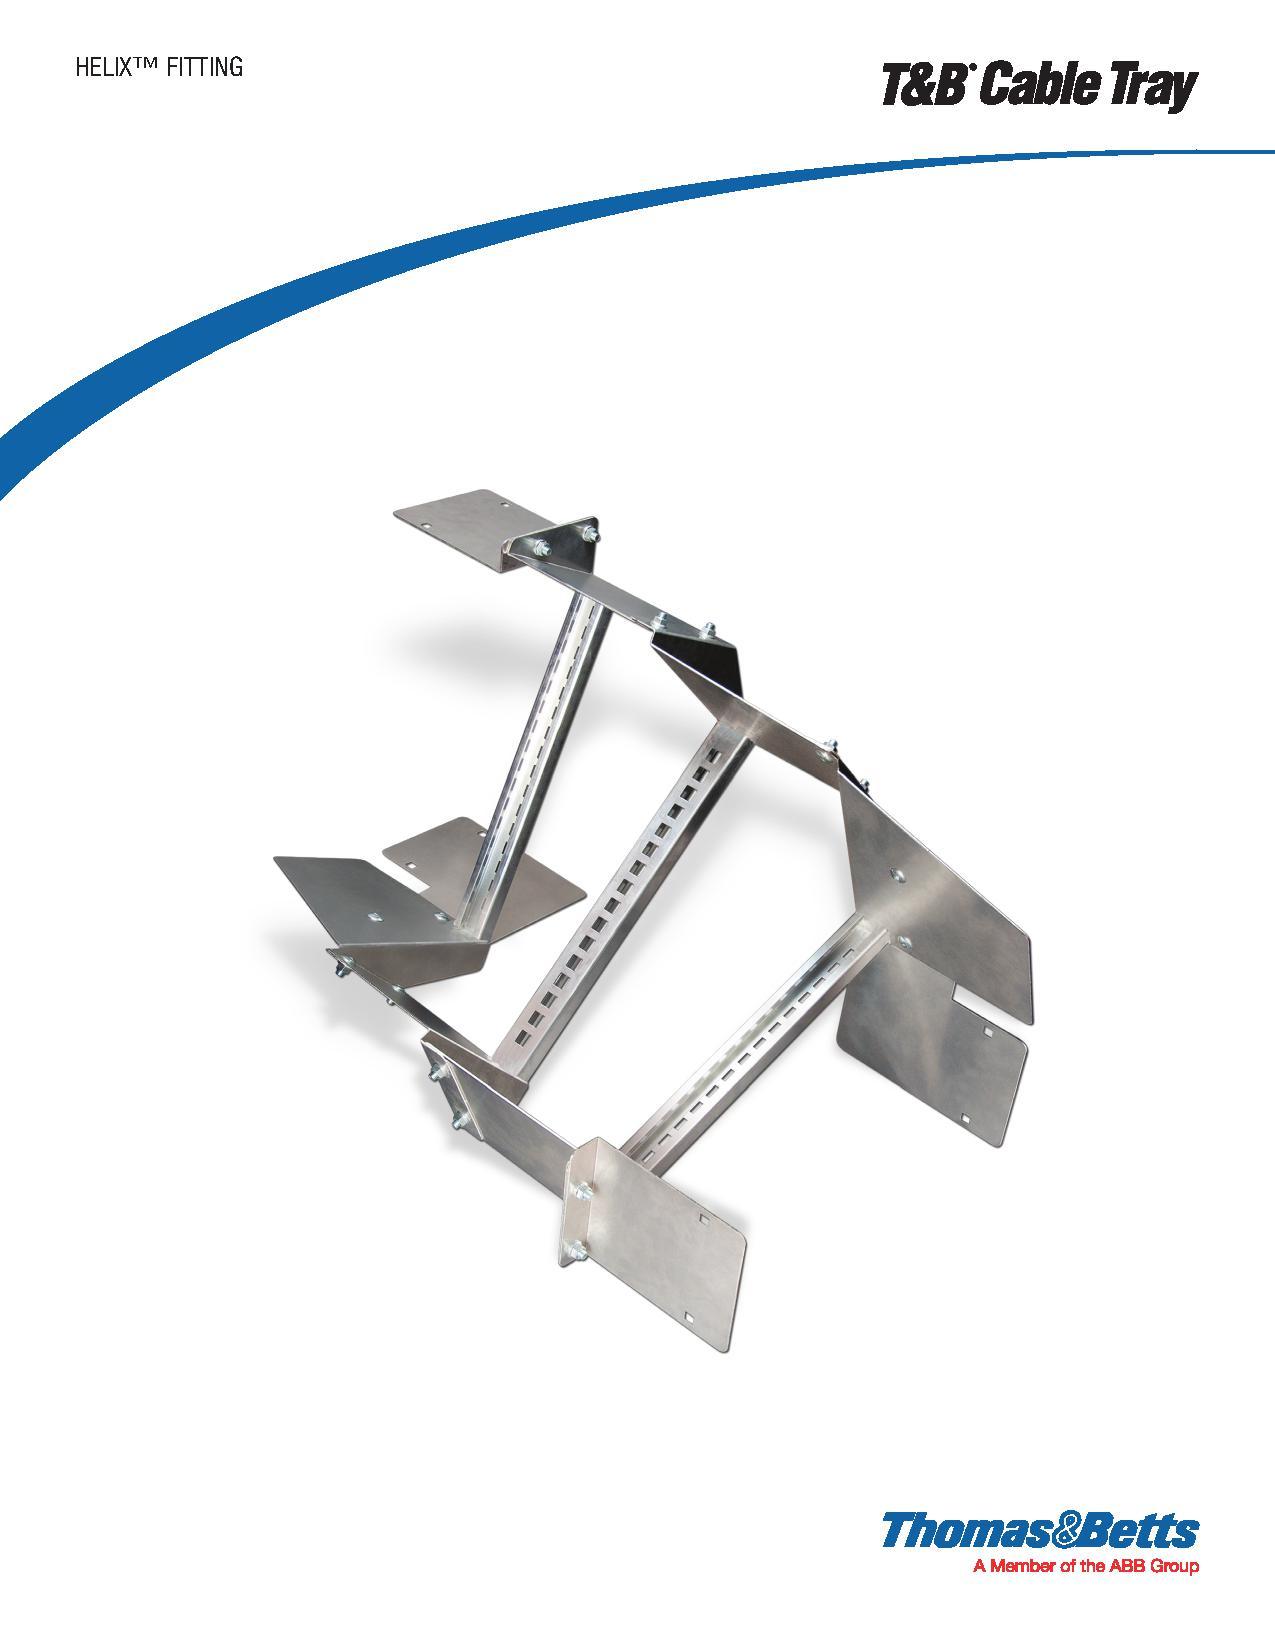 Tb Blackburn Solar Panel Feed Through Grounding Lug Ajb Sales Wiring Diagram Thomas Betts Helix Cable Tray Transition Fitting